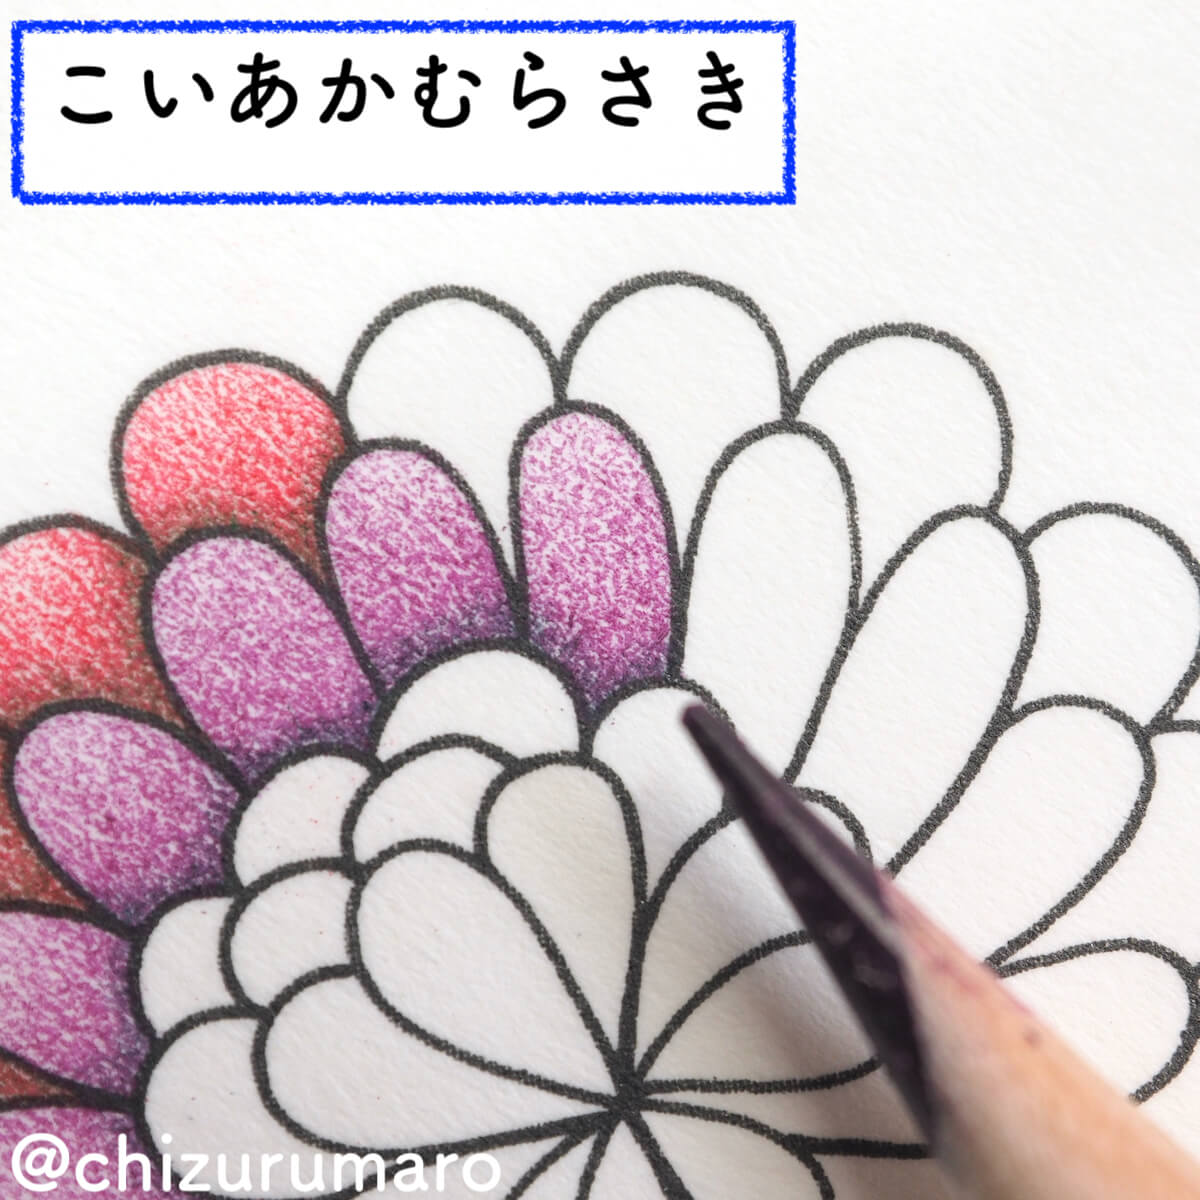 f:id:chizurumaro:20200326115104j:plain